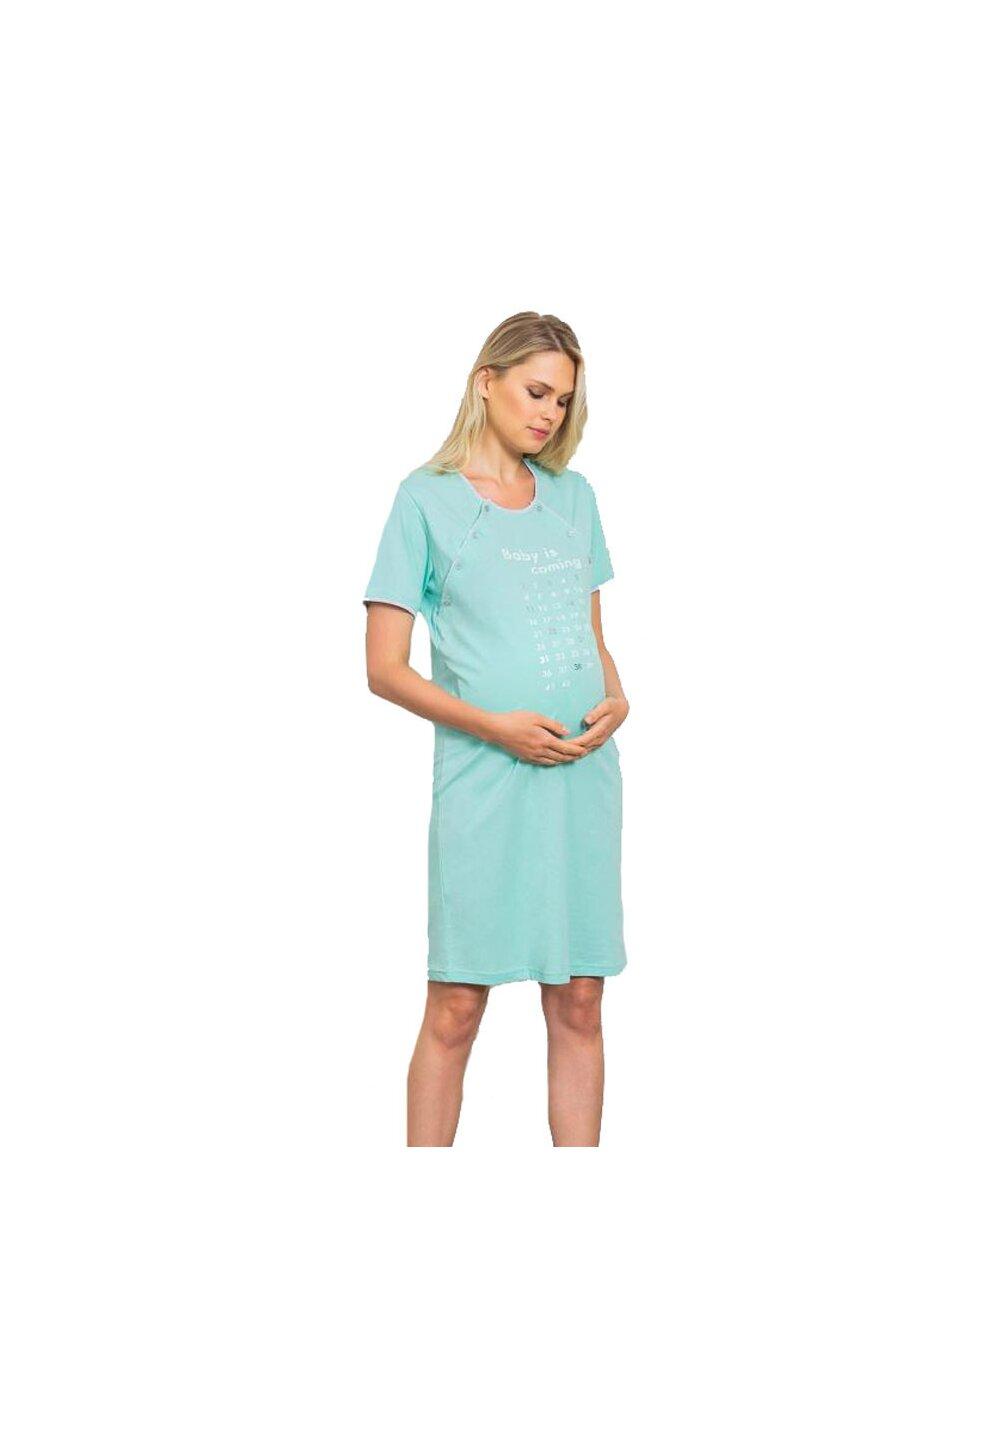 Camasa pentru alaptat, Baby is coming imagine